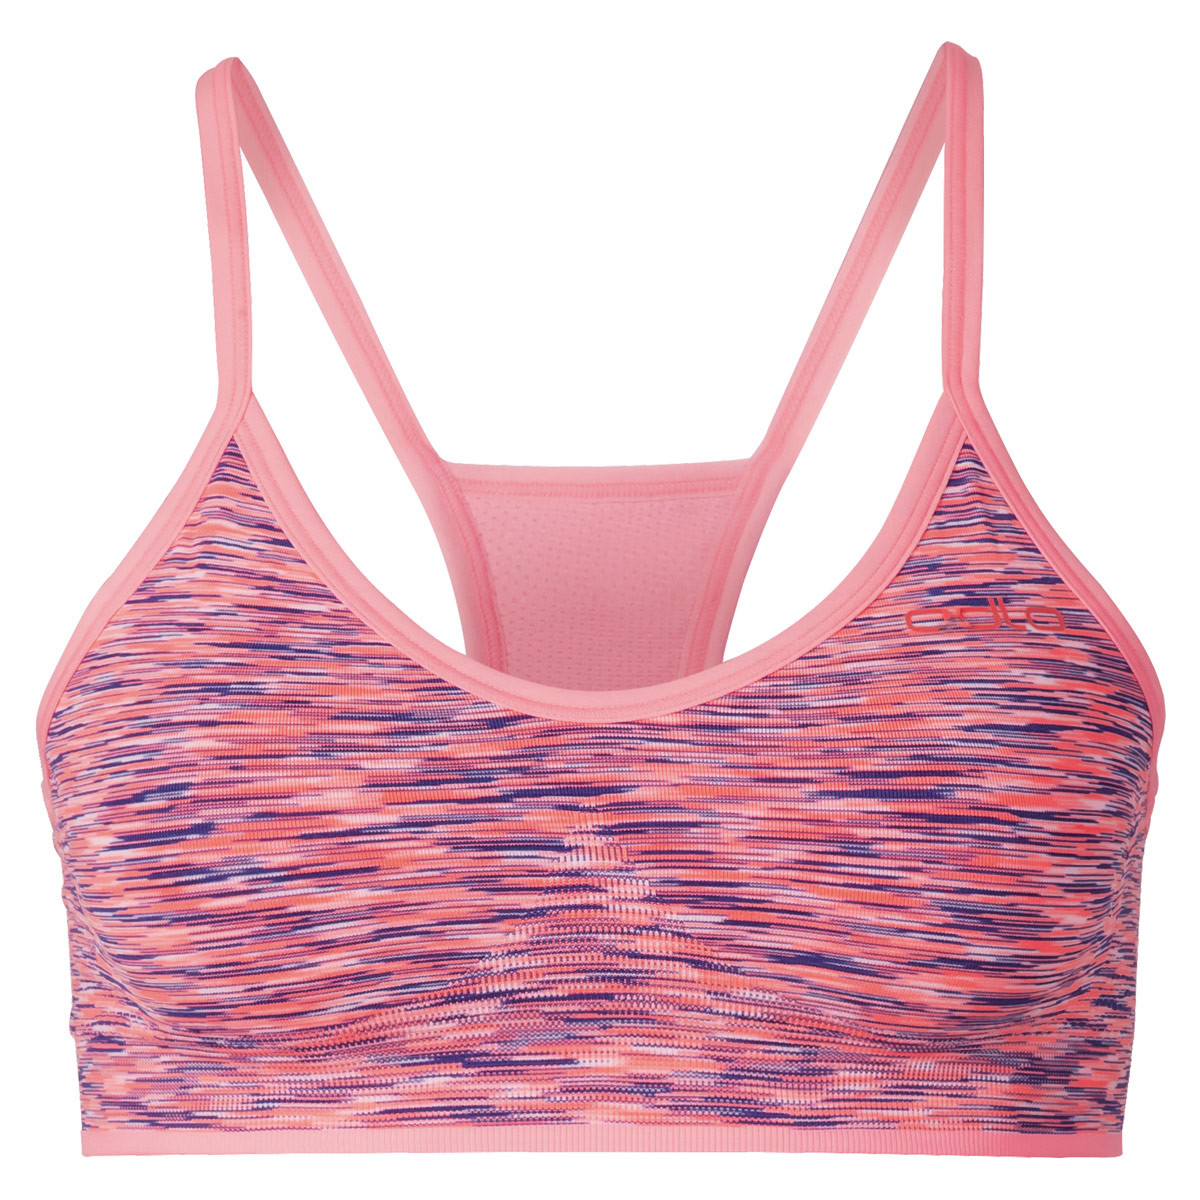 ca02573a95 Odlo Sports Bra Fitness Soft - Functional underwear for Women - Red ...